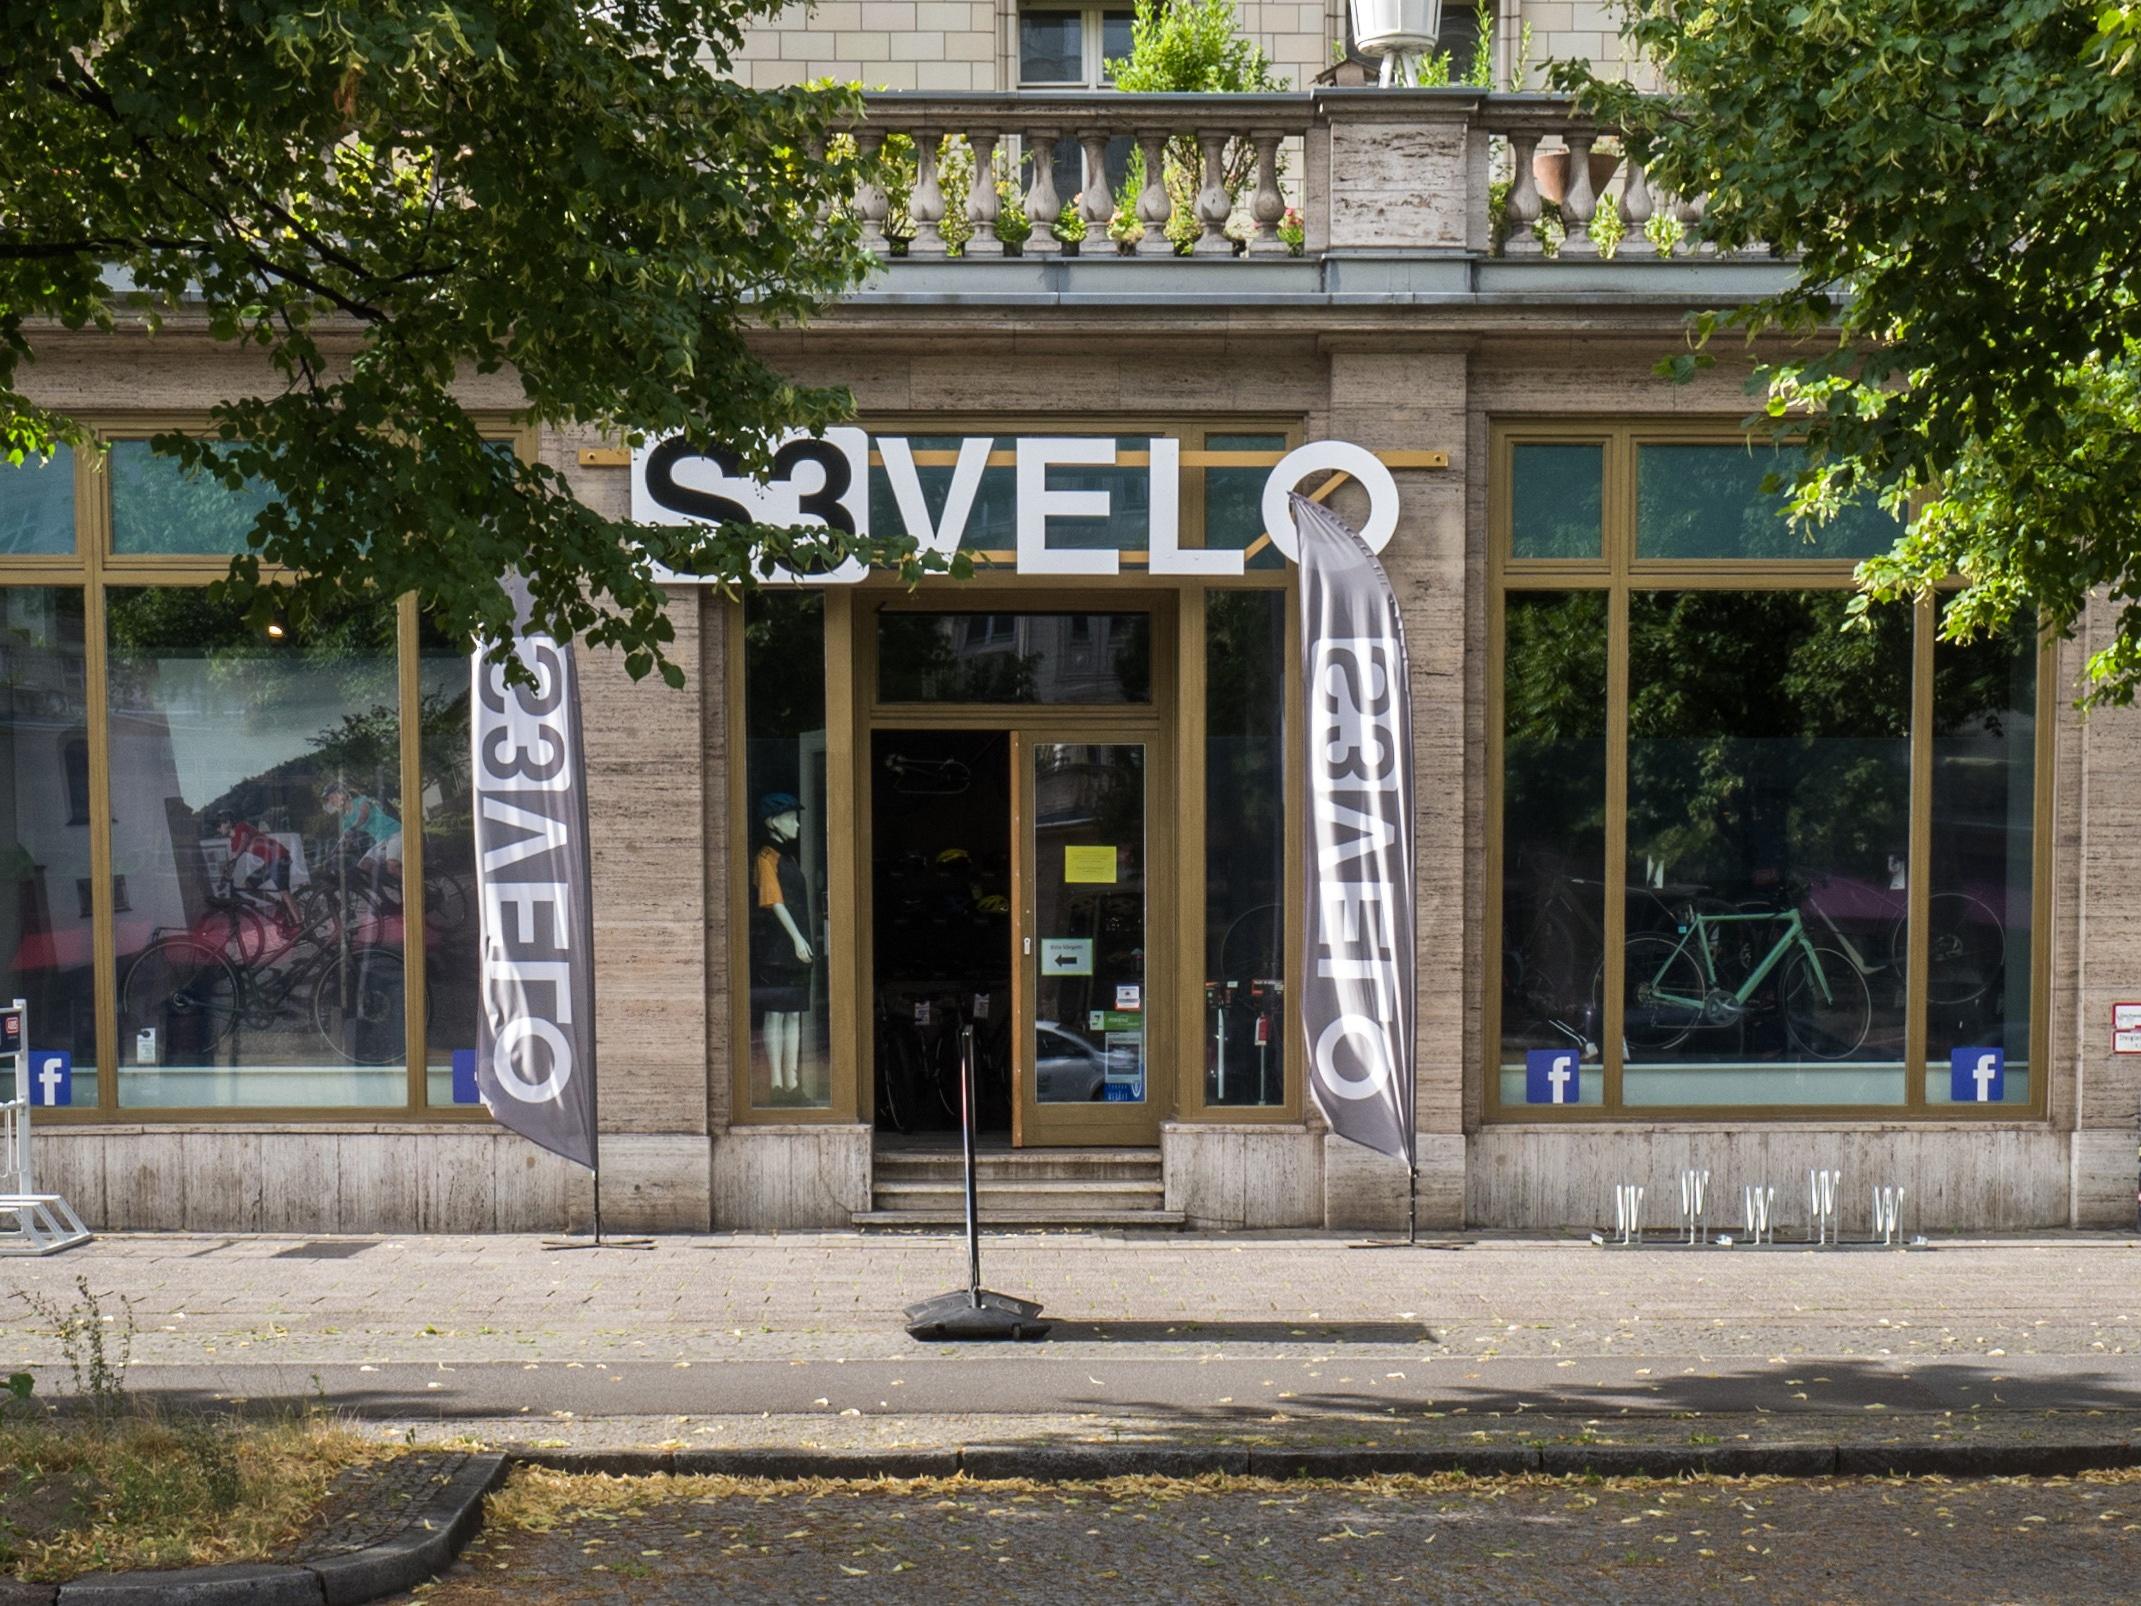 Fahrrad S3Velo